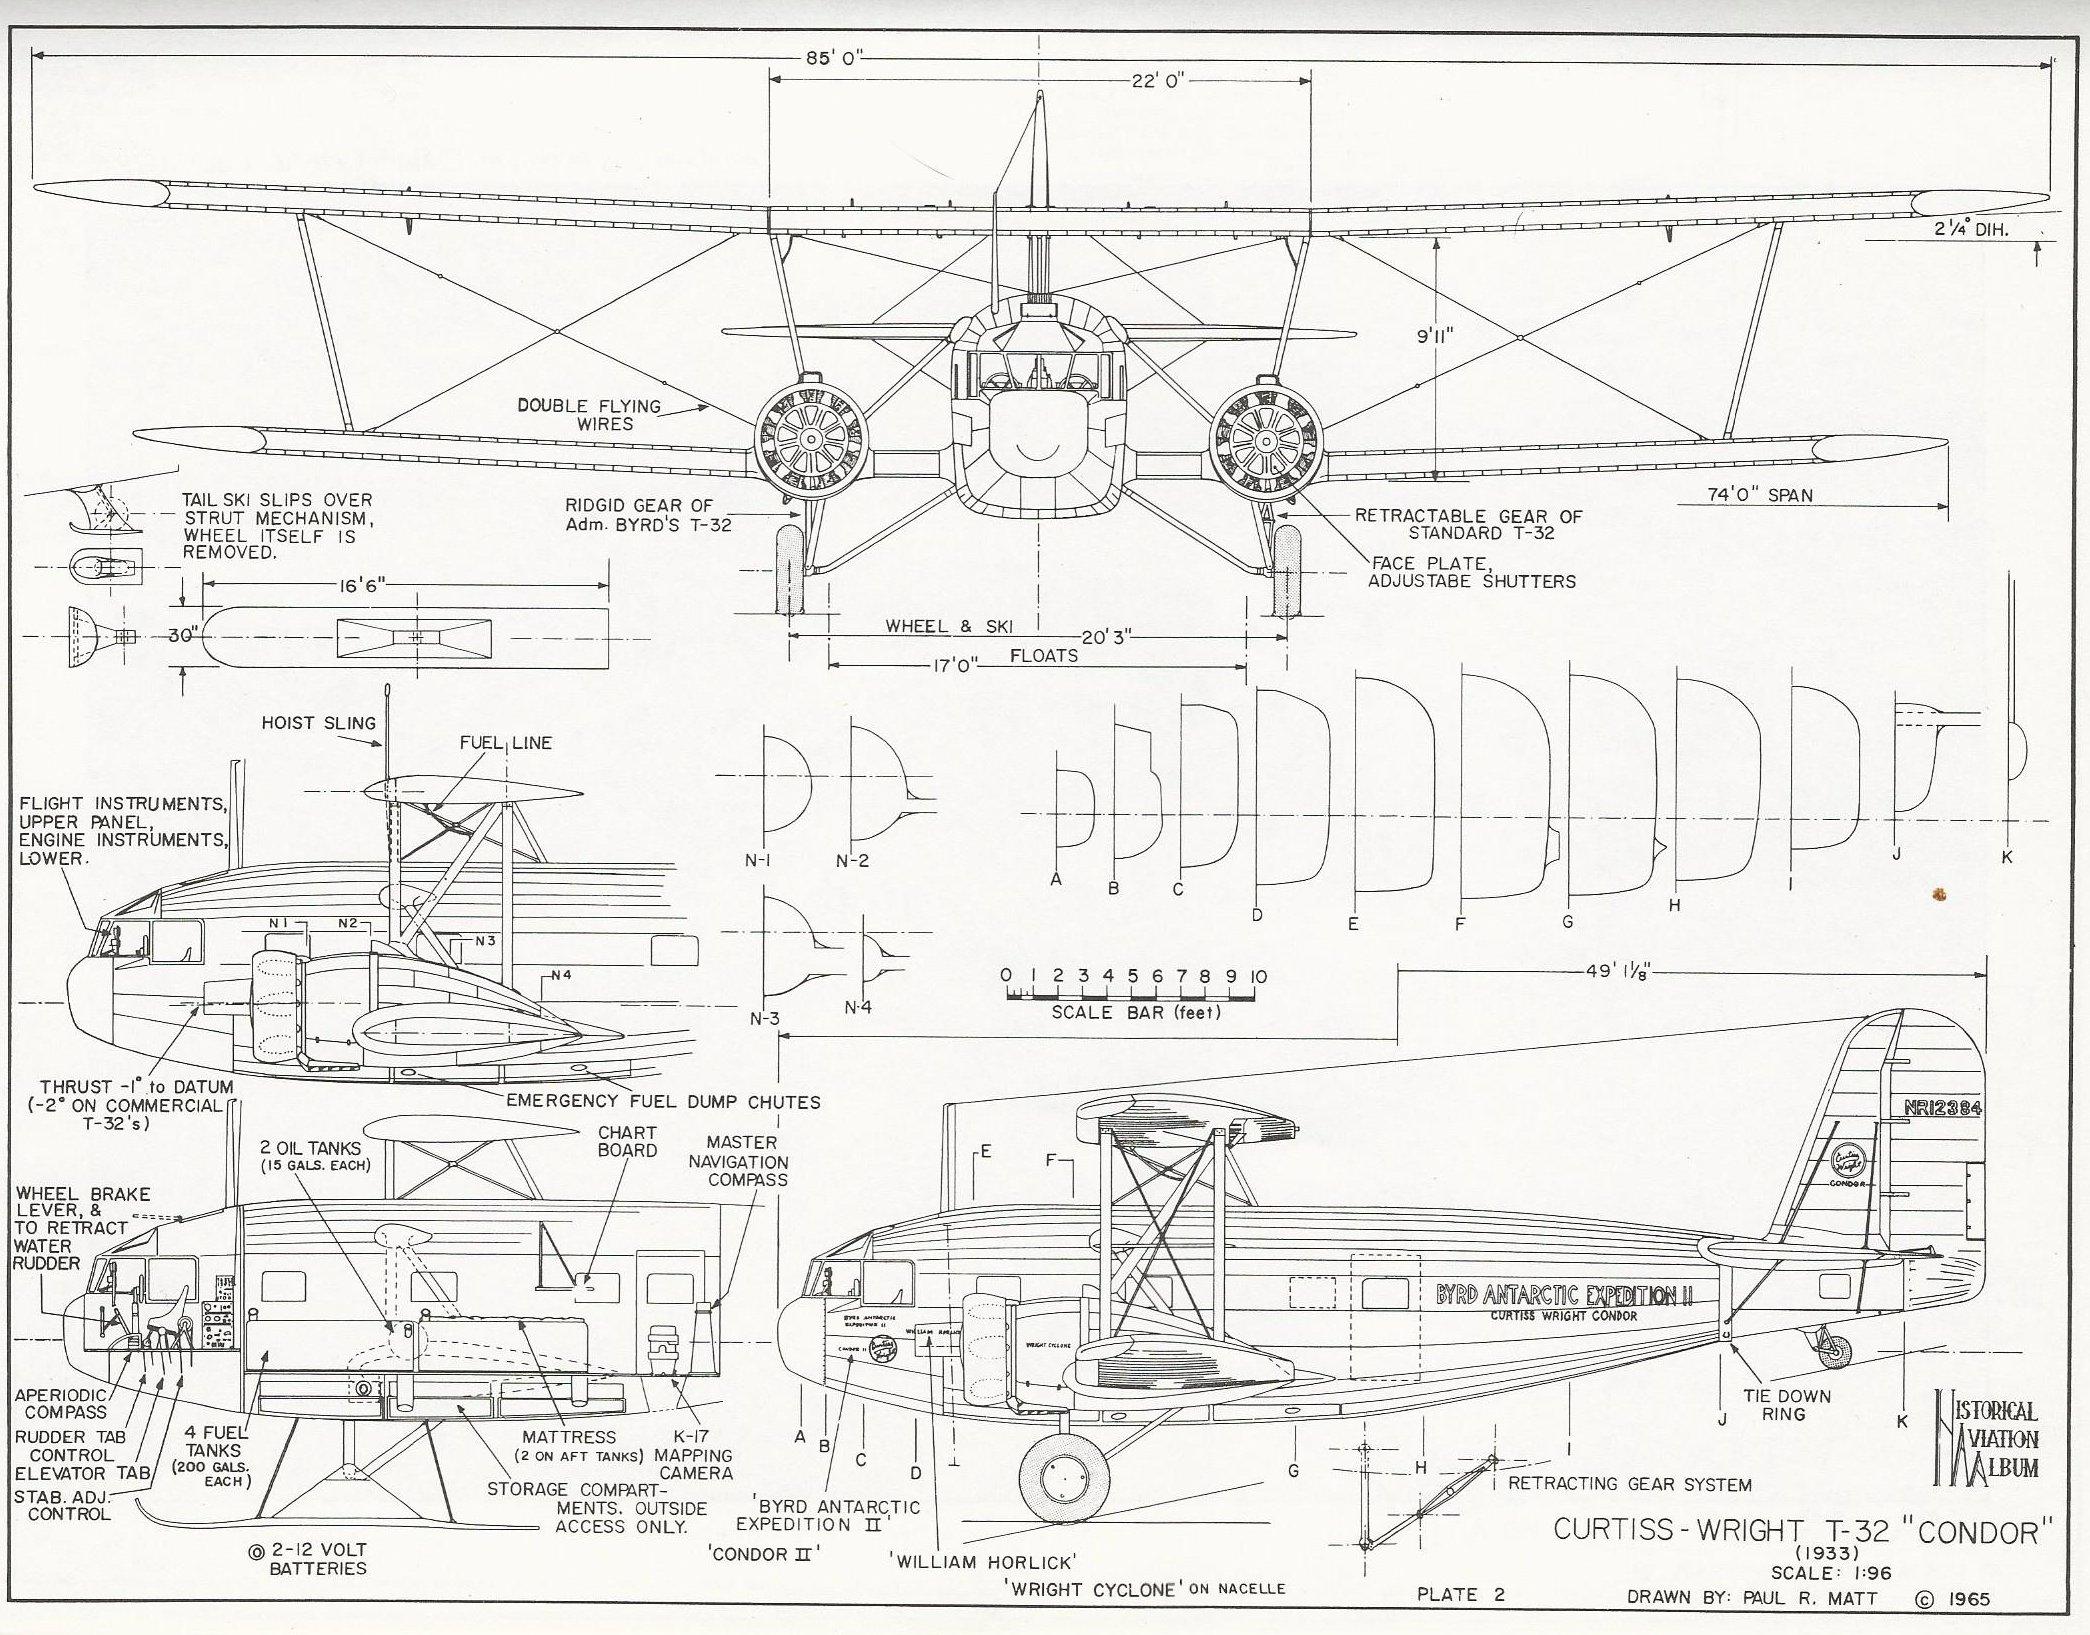 Curtiss Wright Condor Airlinerer Polar Explorer